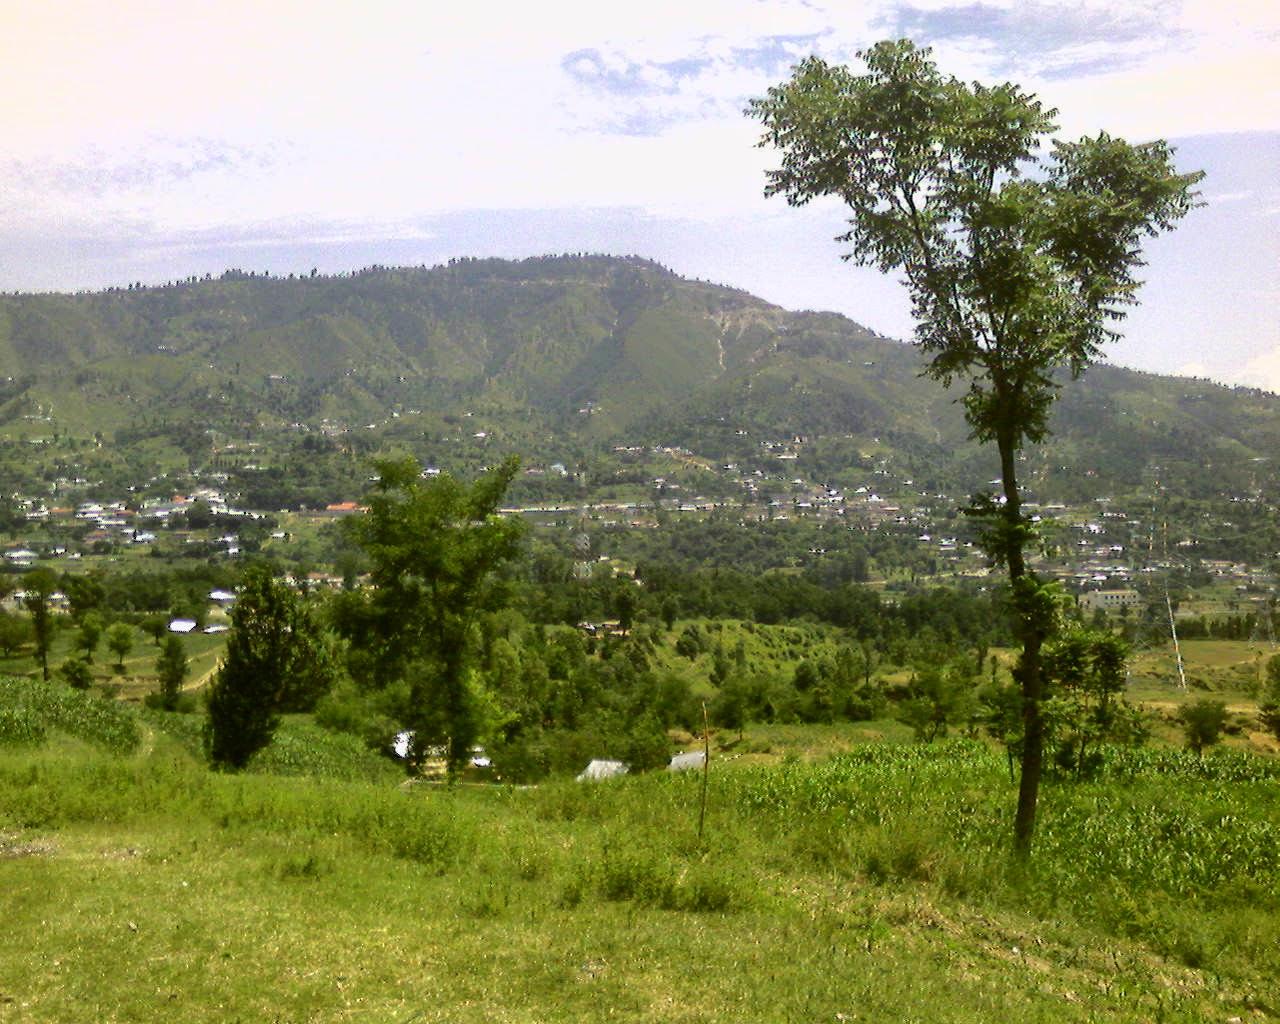 Ahead of Shinkiari, towards Battal